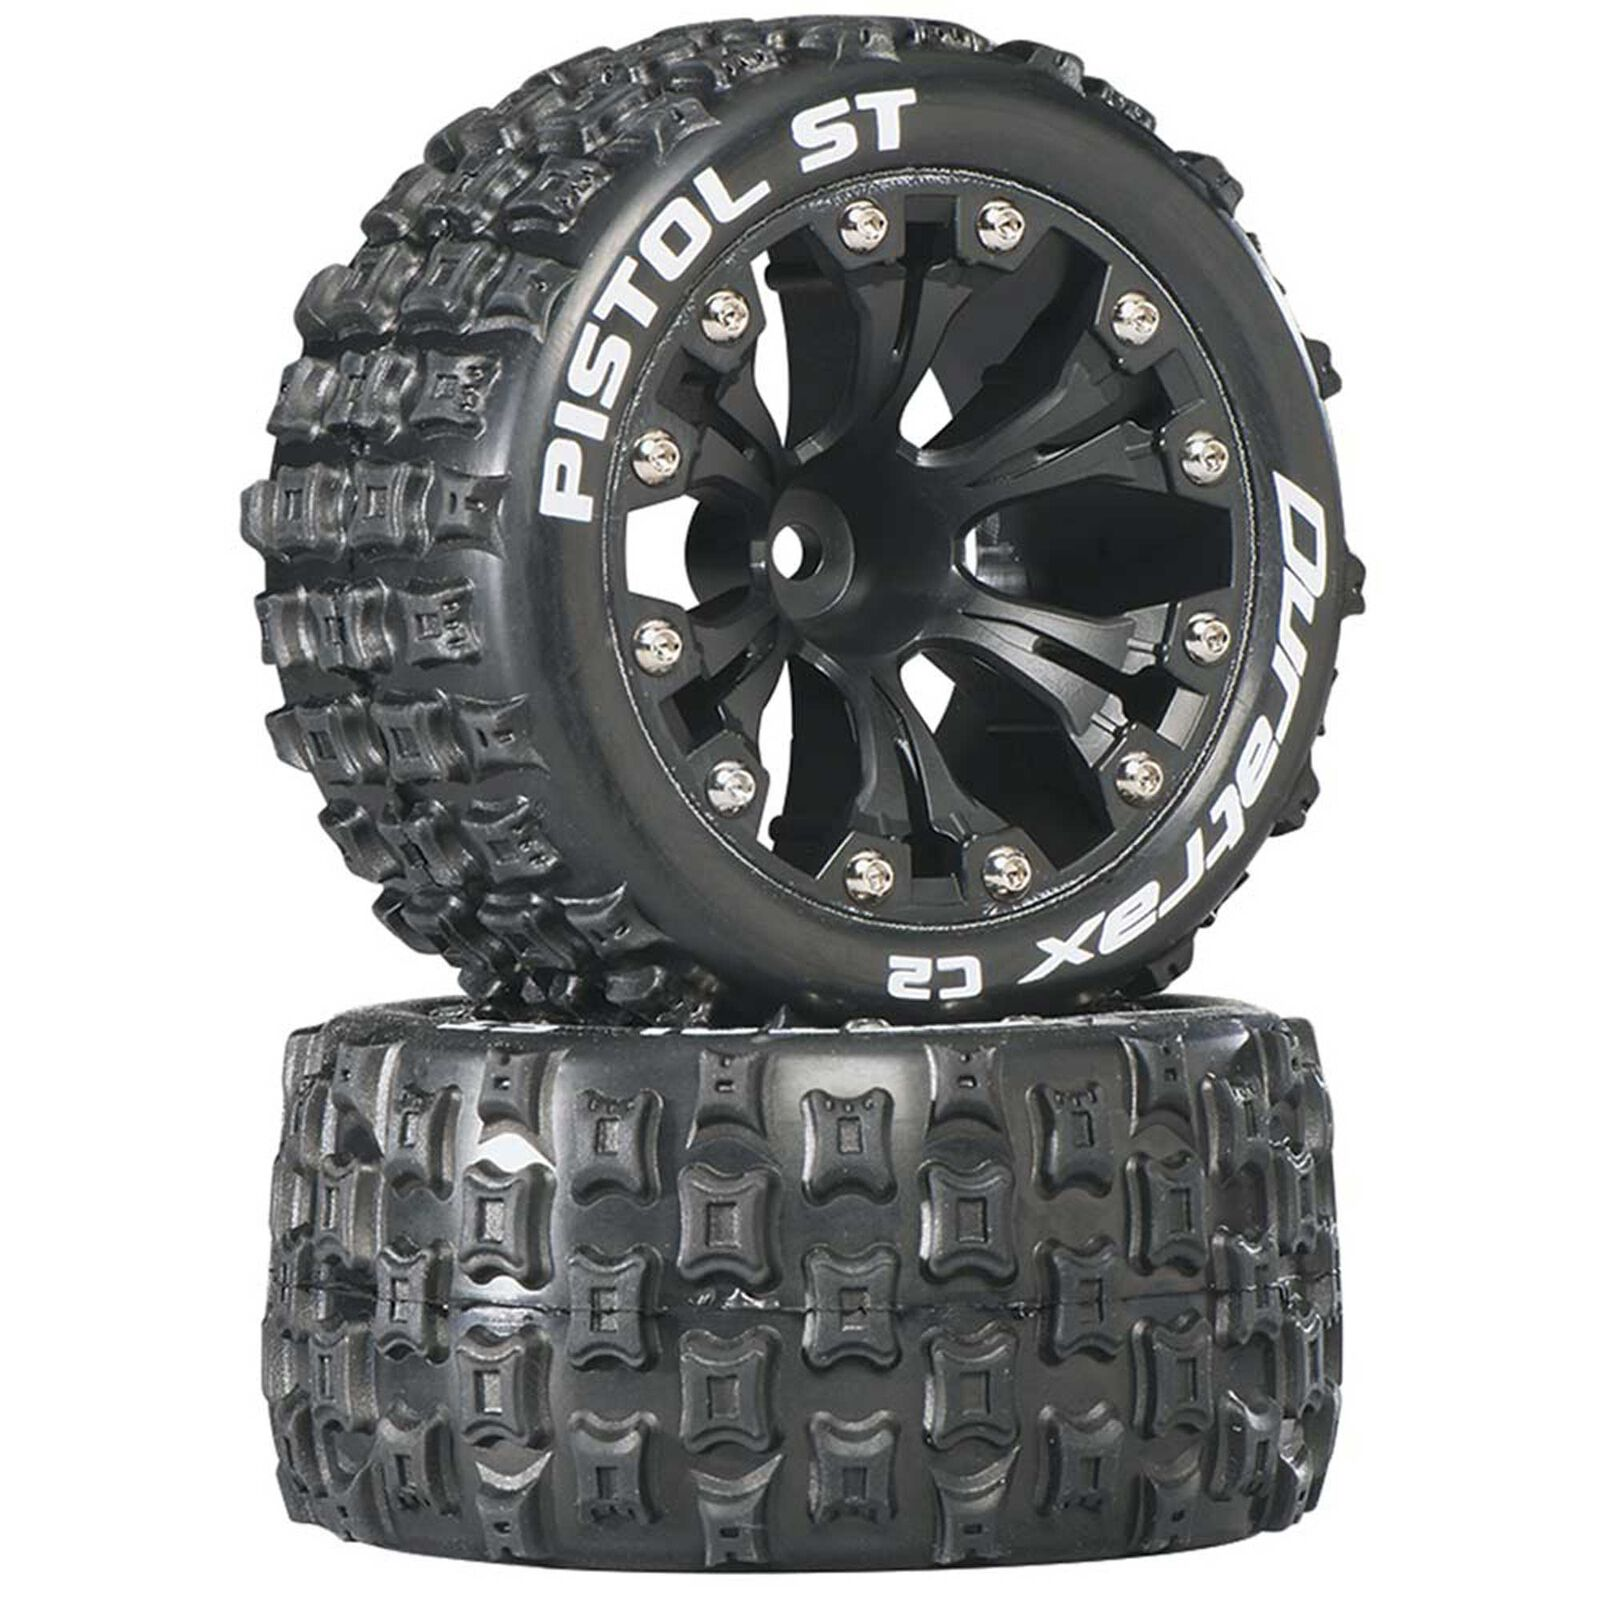 "Pistol ST 2.8"" Mounted 1/2"" Offset C2 Tires, Black (2)"